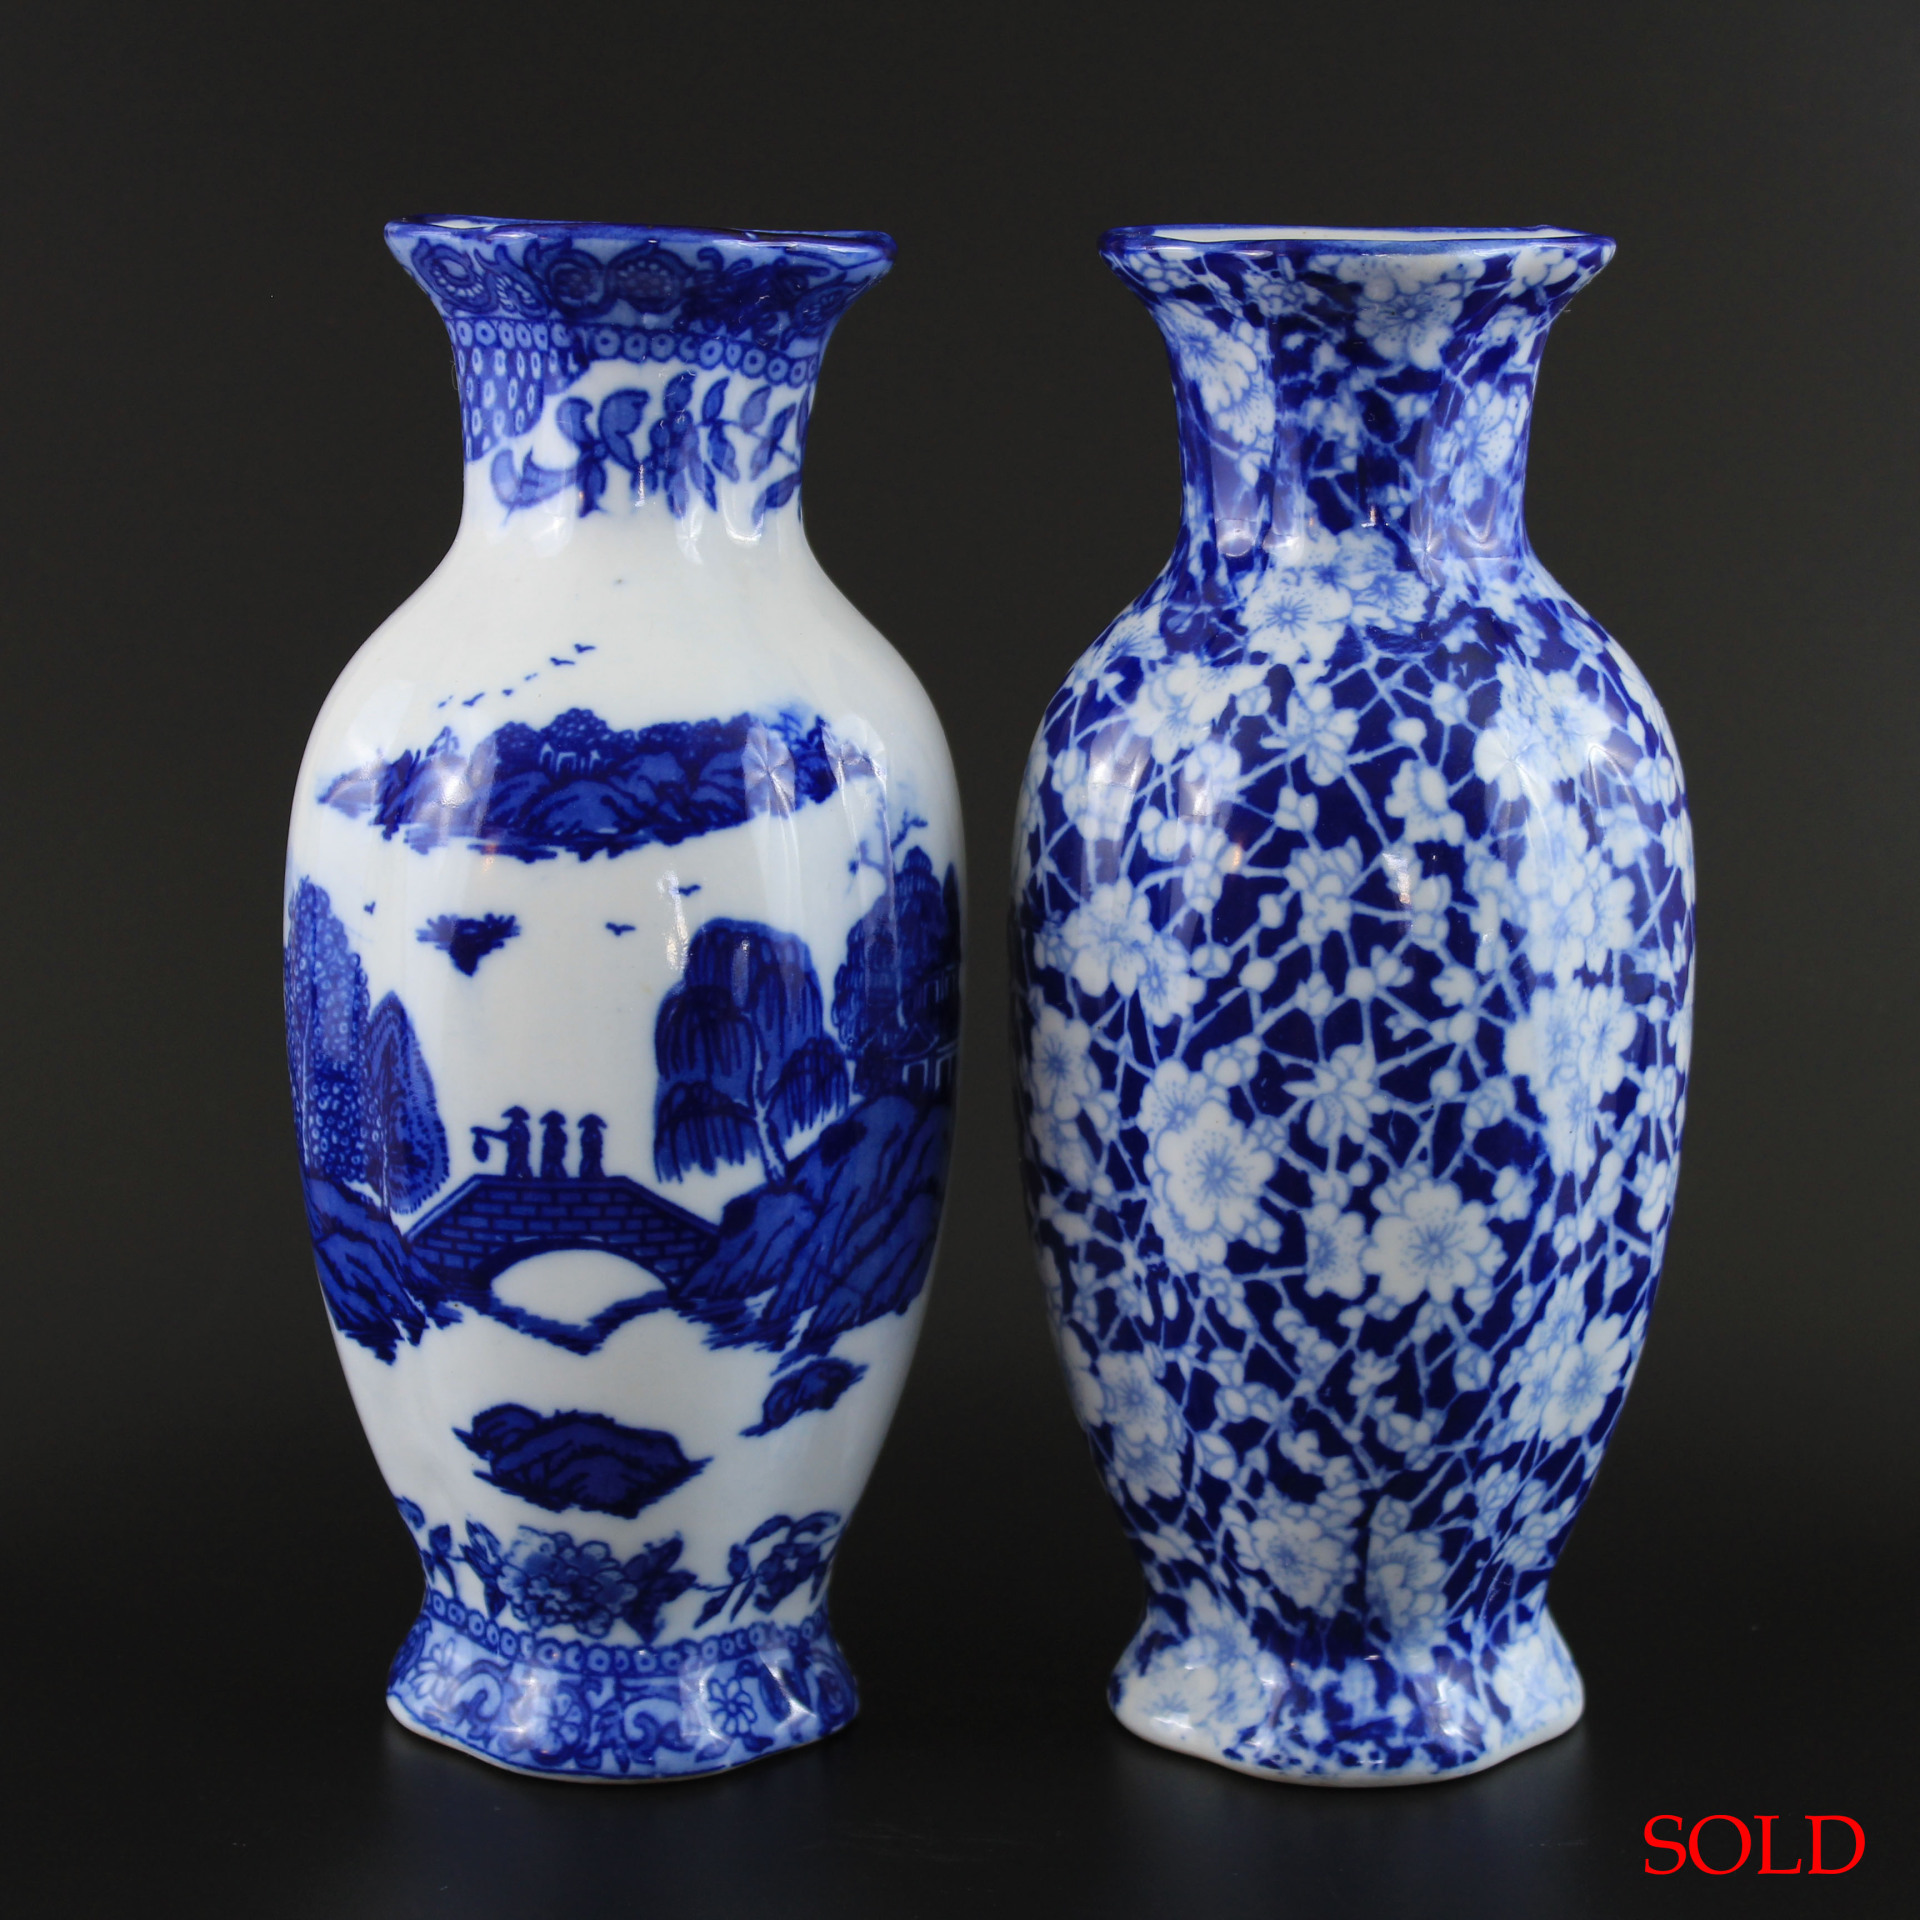 2 Vintage Chinese Blue & White Porcelain Wall Vases